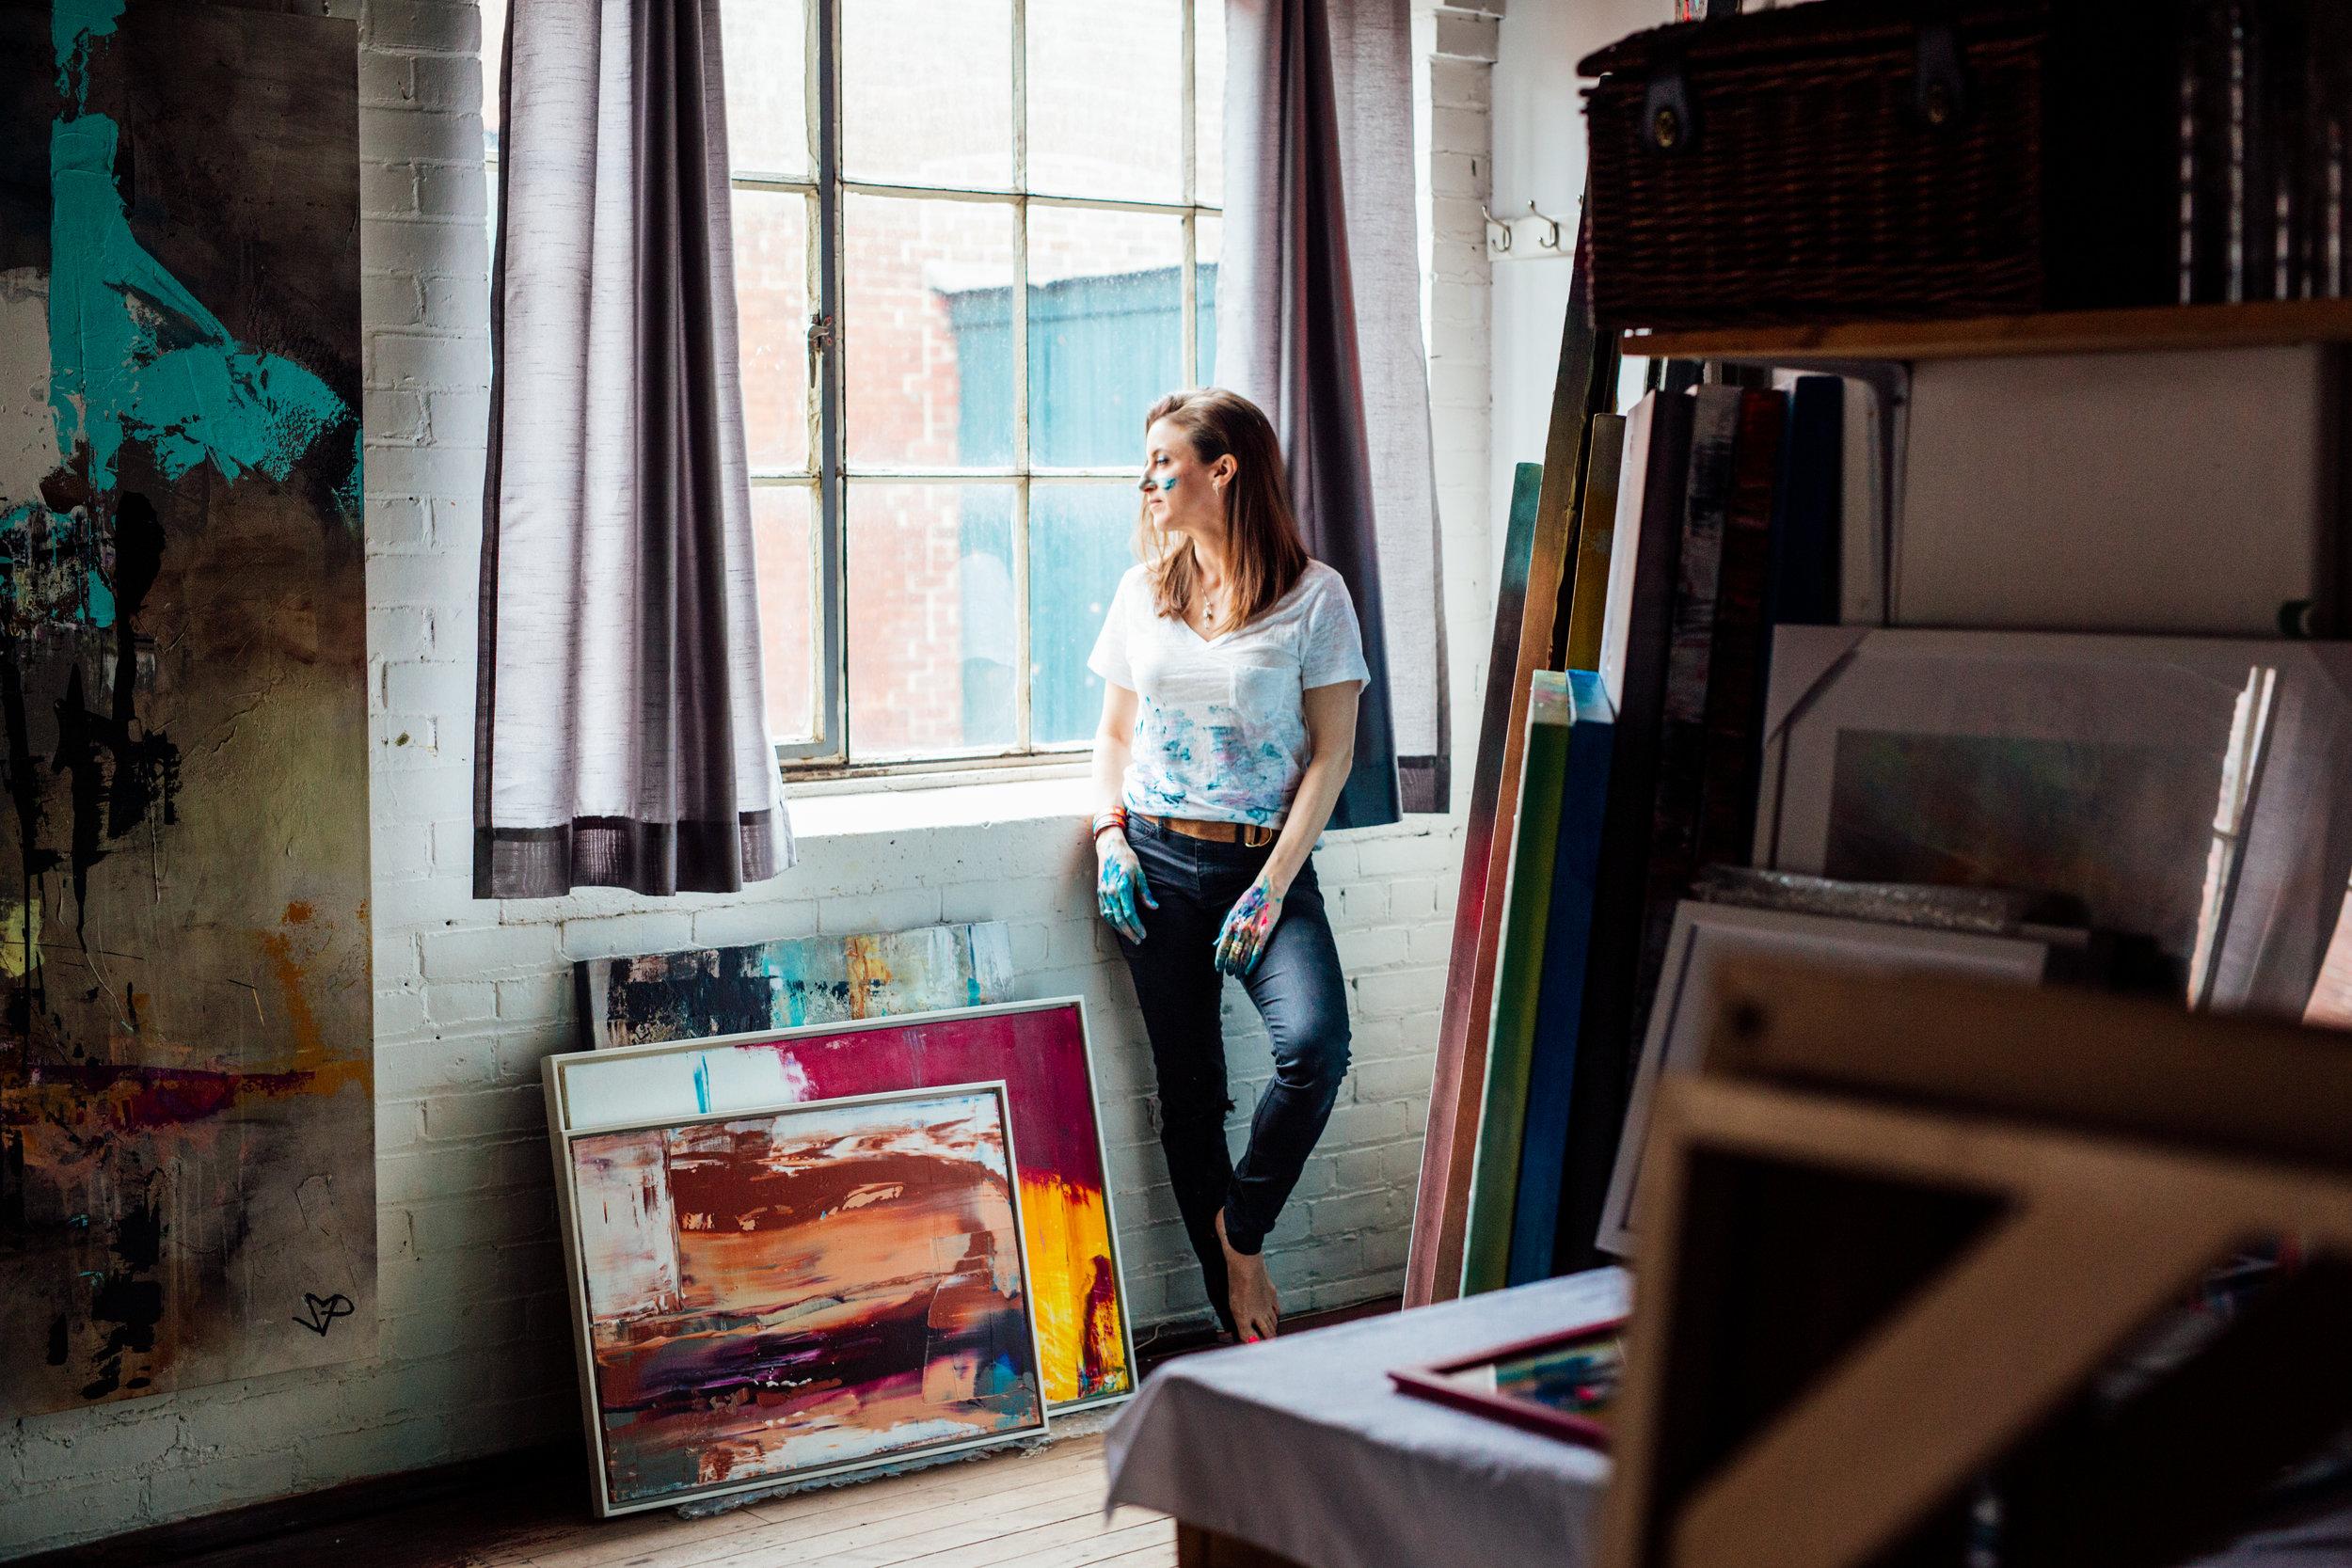 SarahPhelpsbyBettinaBogarTorontoPhotographer-55.jpg